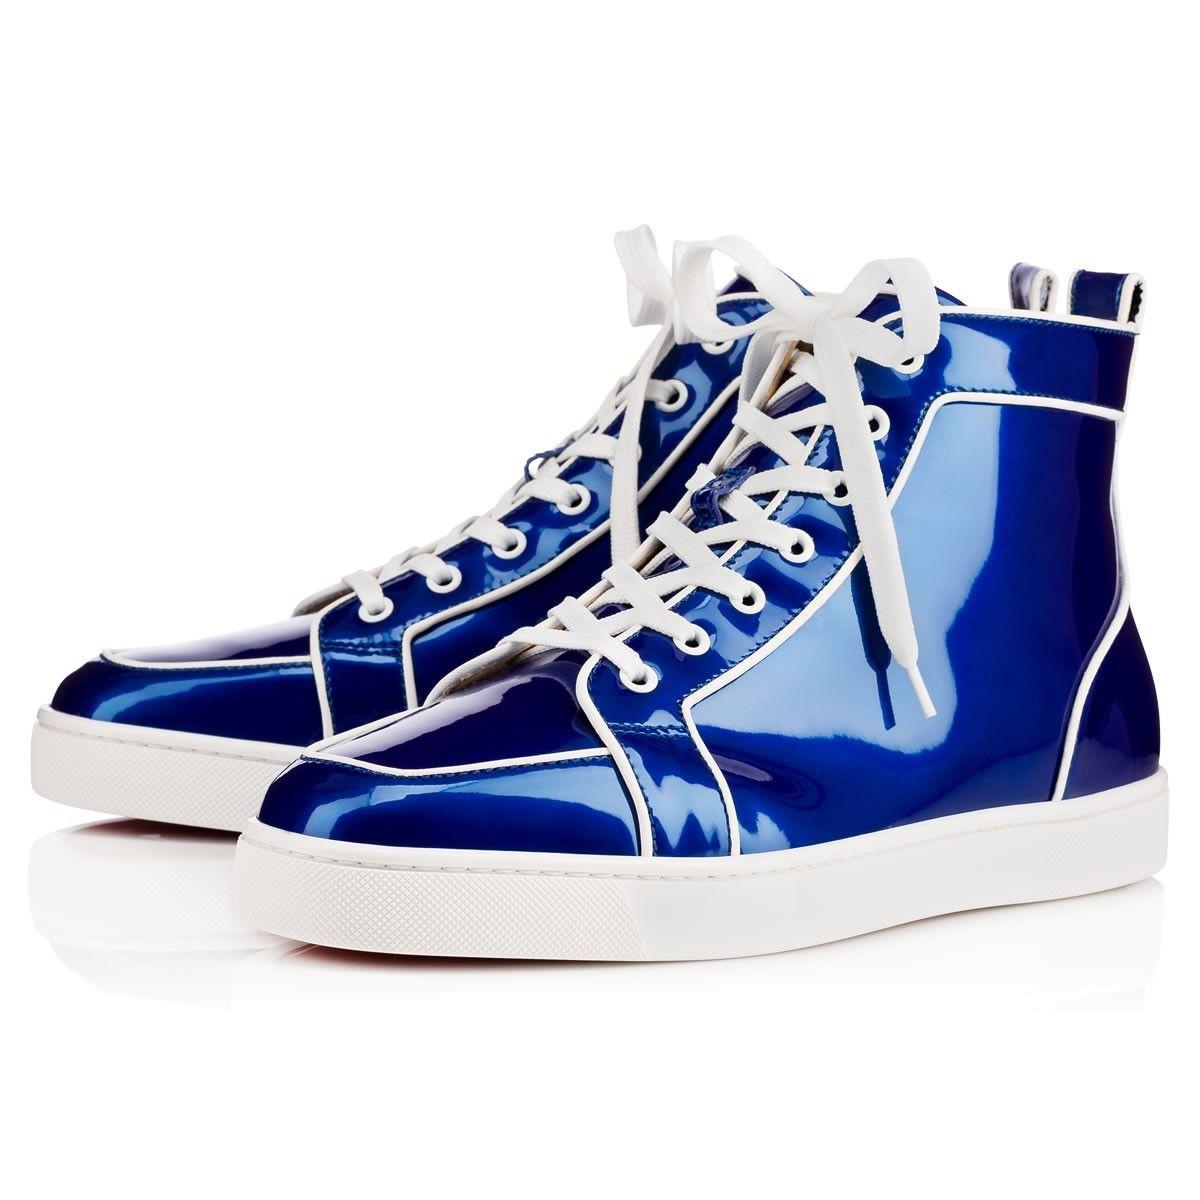 c9d2fb8663ee CHRISTIAN LOUBOUTIN Rantus Orlato Men S Flat Blue Latte Glossy Patent - Men  Shoes - Christian Louboutin.  christianlouboutin  shoes